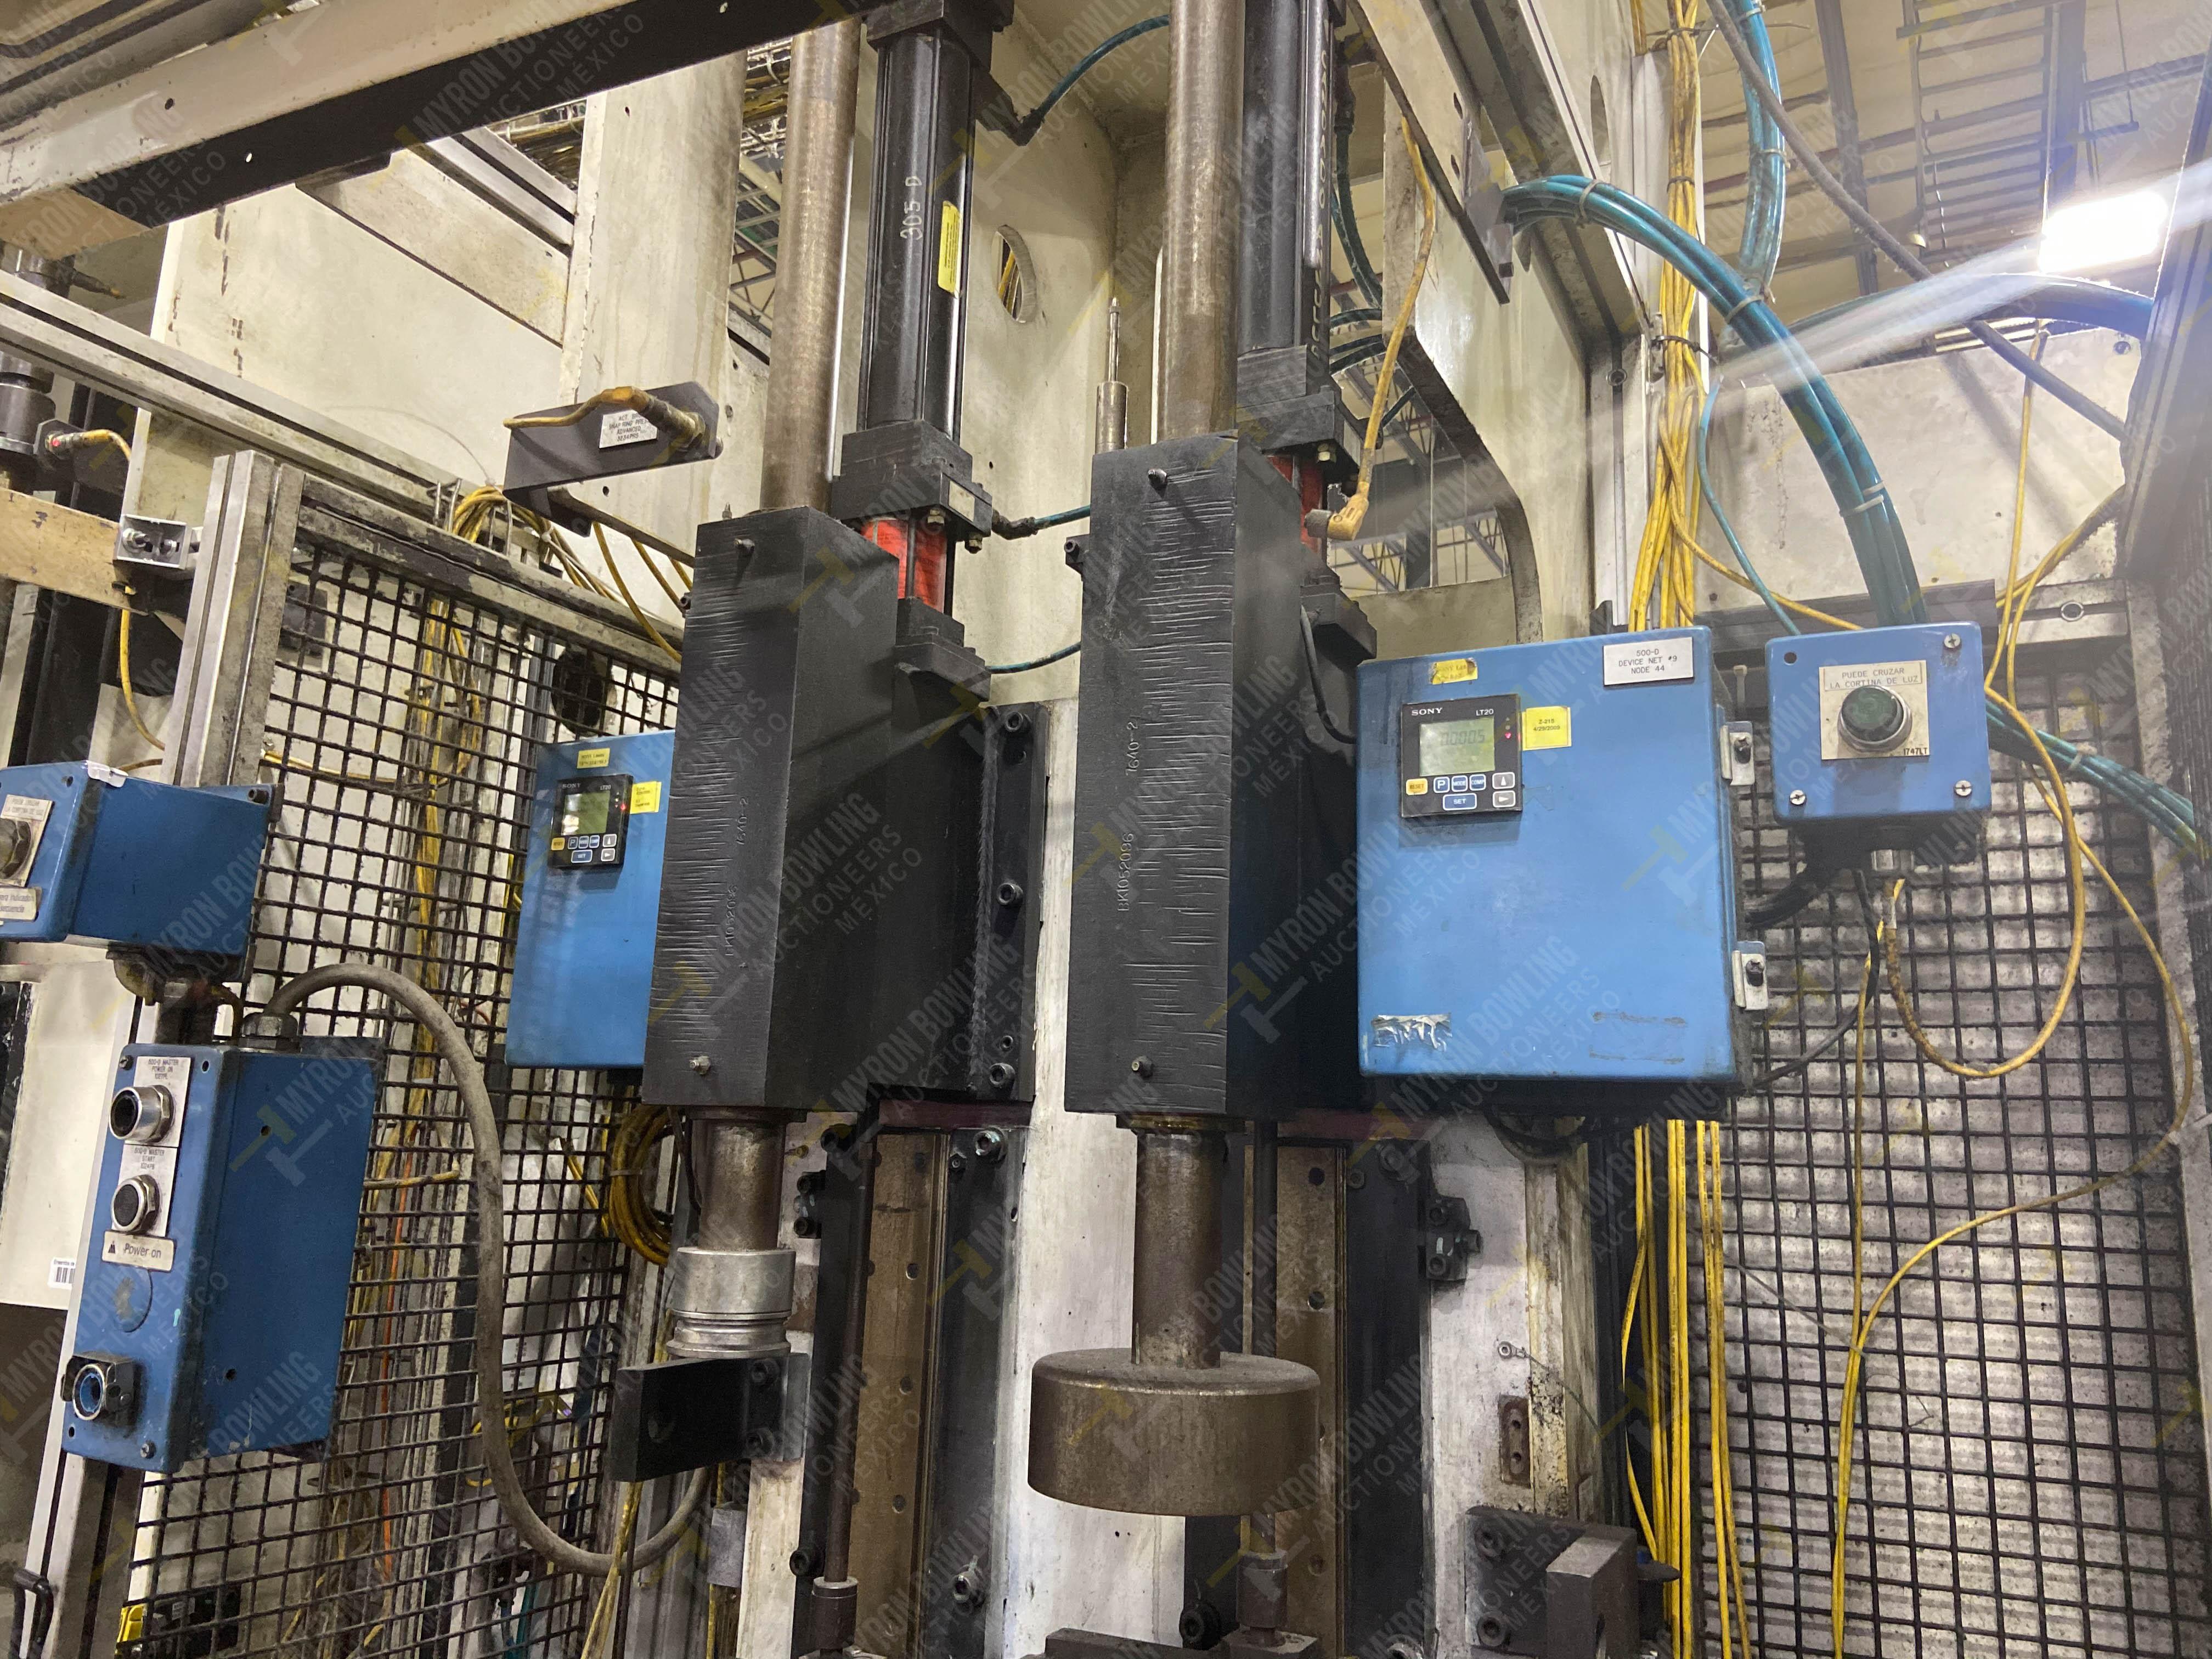 Estación semiautomática para operación 305D, contiene: Prensa tipo cuello de ganso con dos cilindros - Image 2 of 20